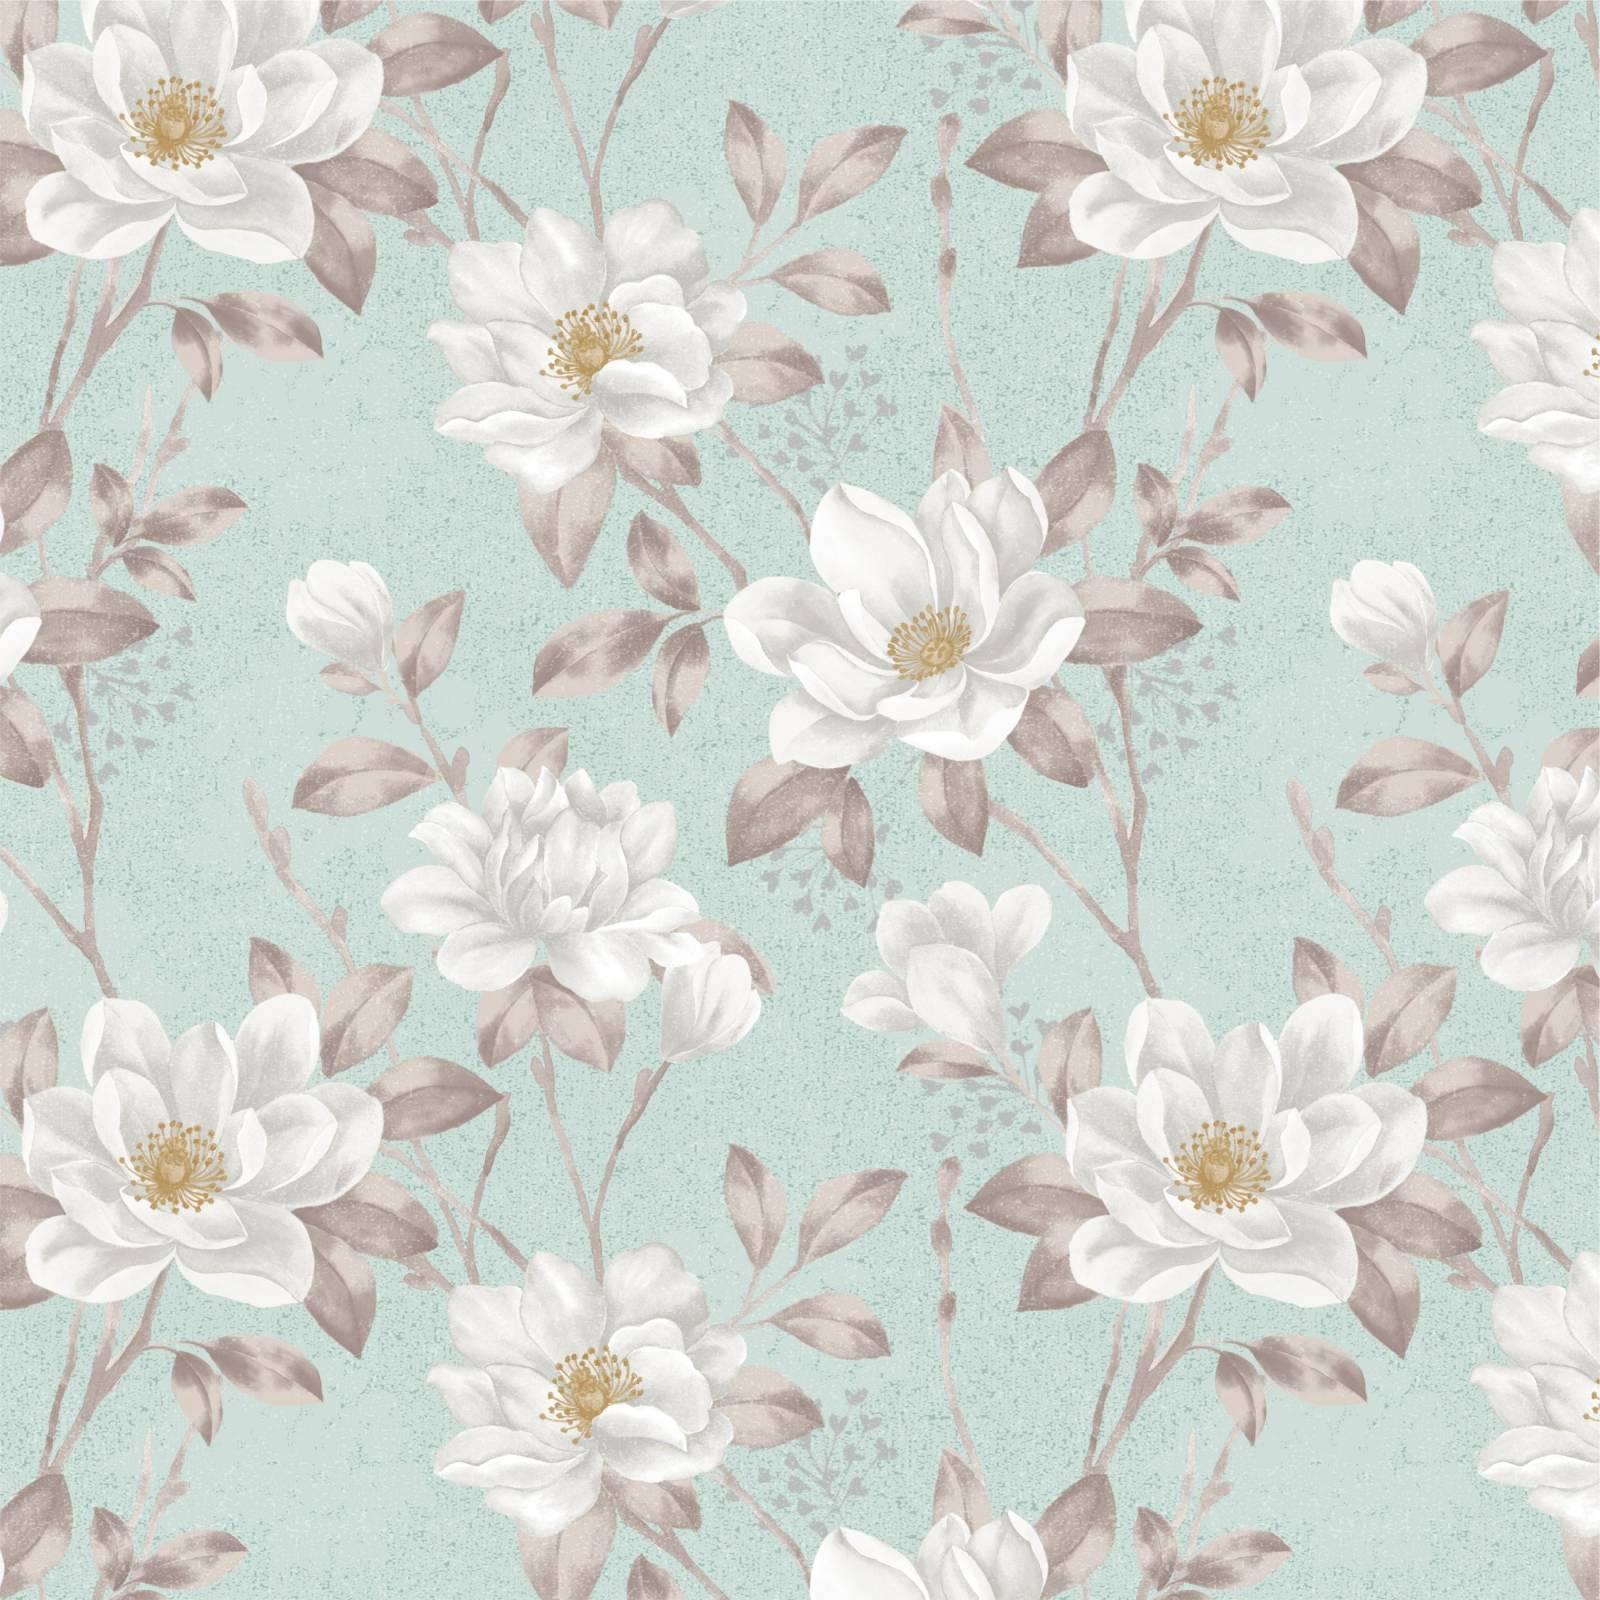 Papel de Parede Floral Flores Brancas | Adesivo Vinilico imagem 1